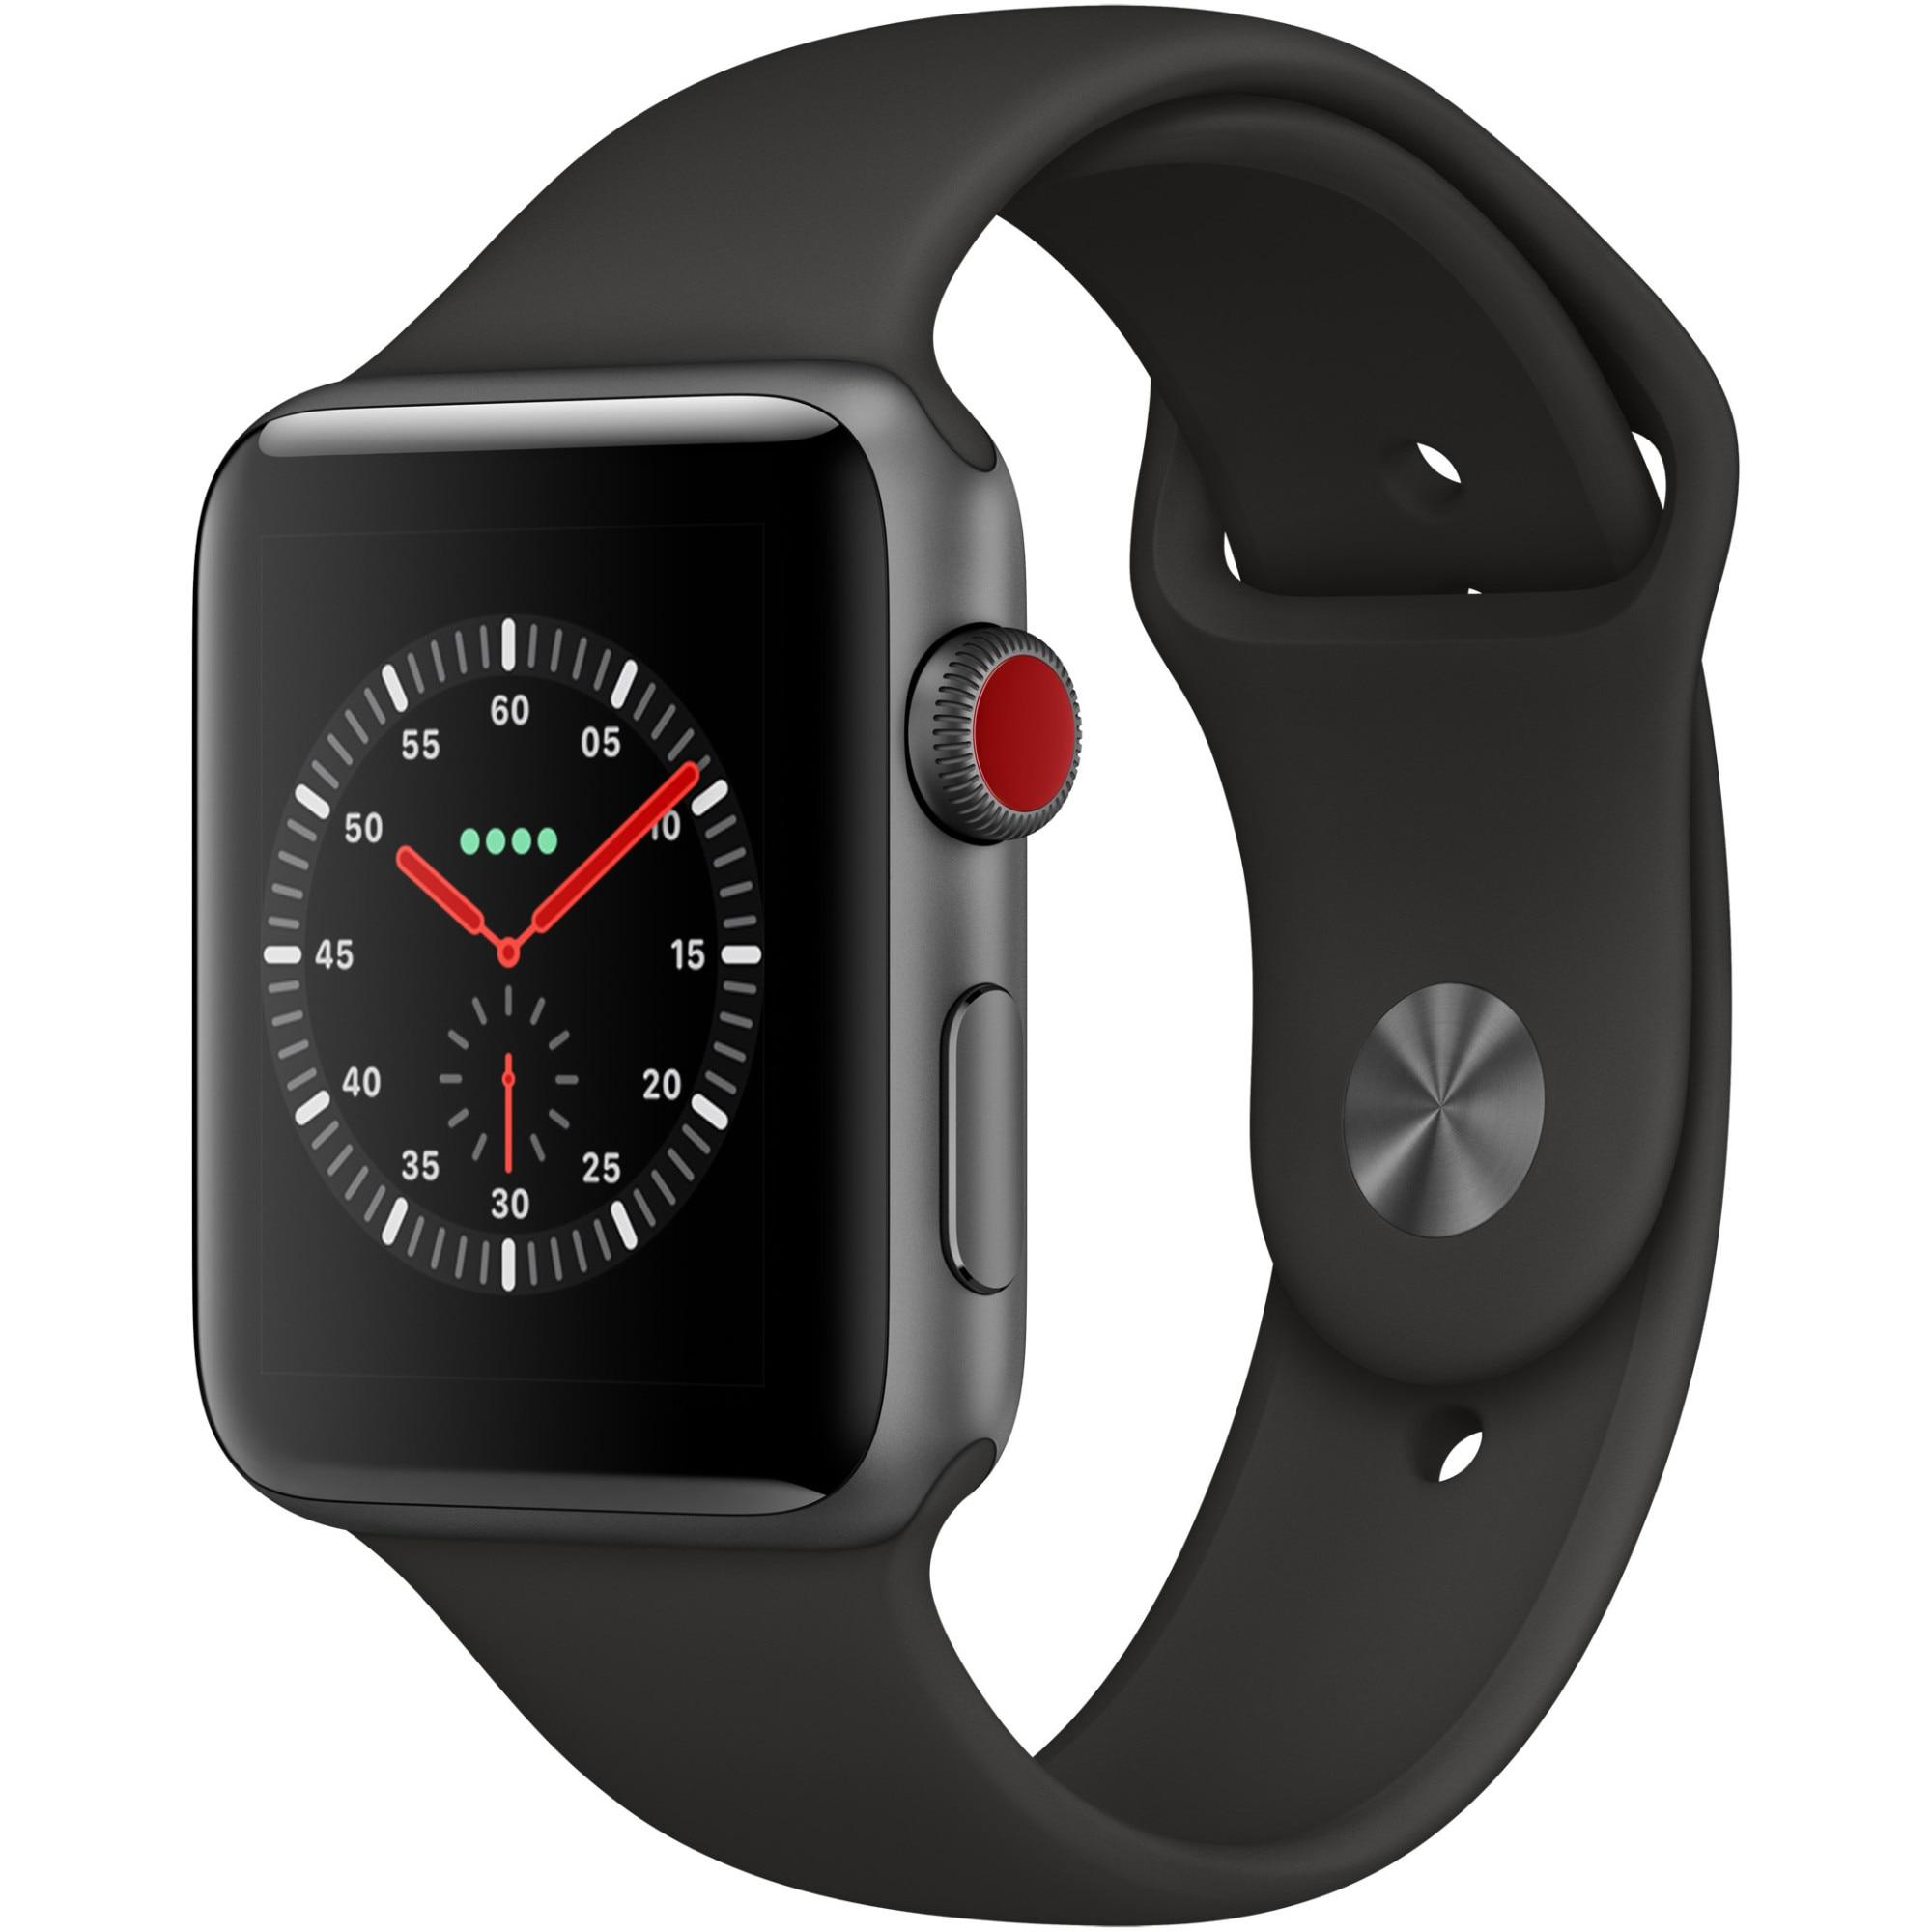 Fotografie Apple Watch 3, GPS, Cellular, Carcasa Space Grey Aluminium 42mm, Black Sport Band